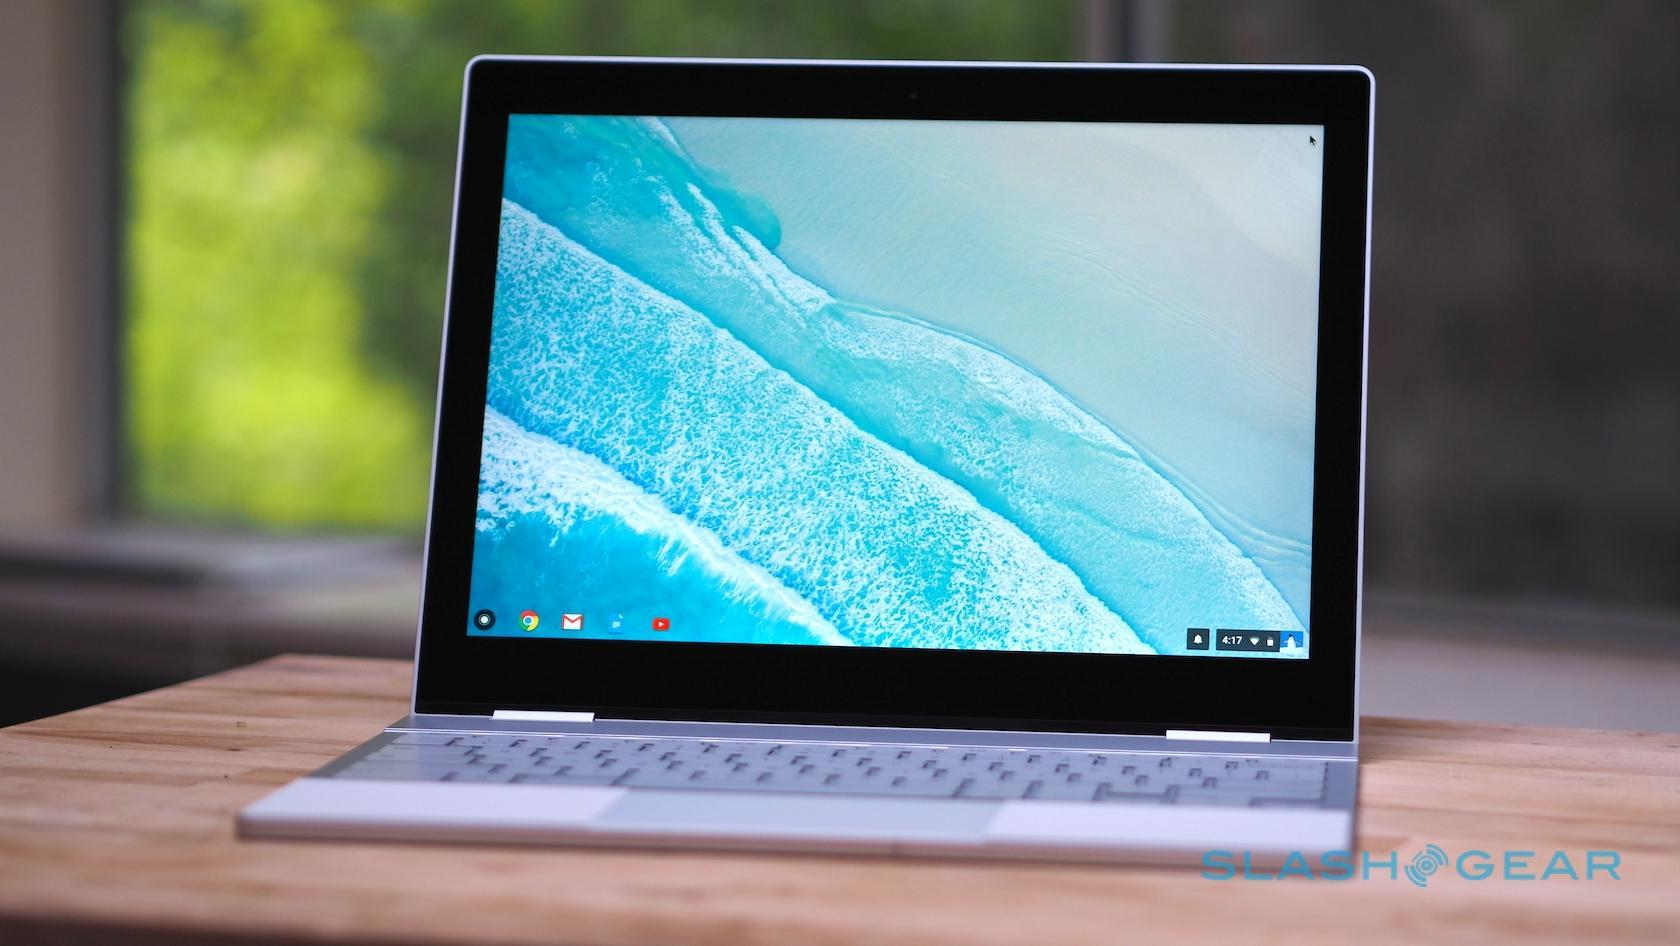 Google Pixelbook Review: Chrome OS plays hardball - SlashGear